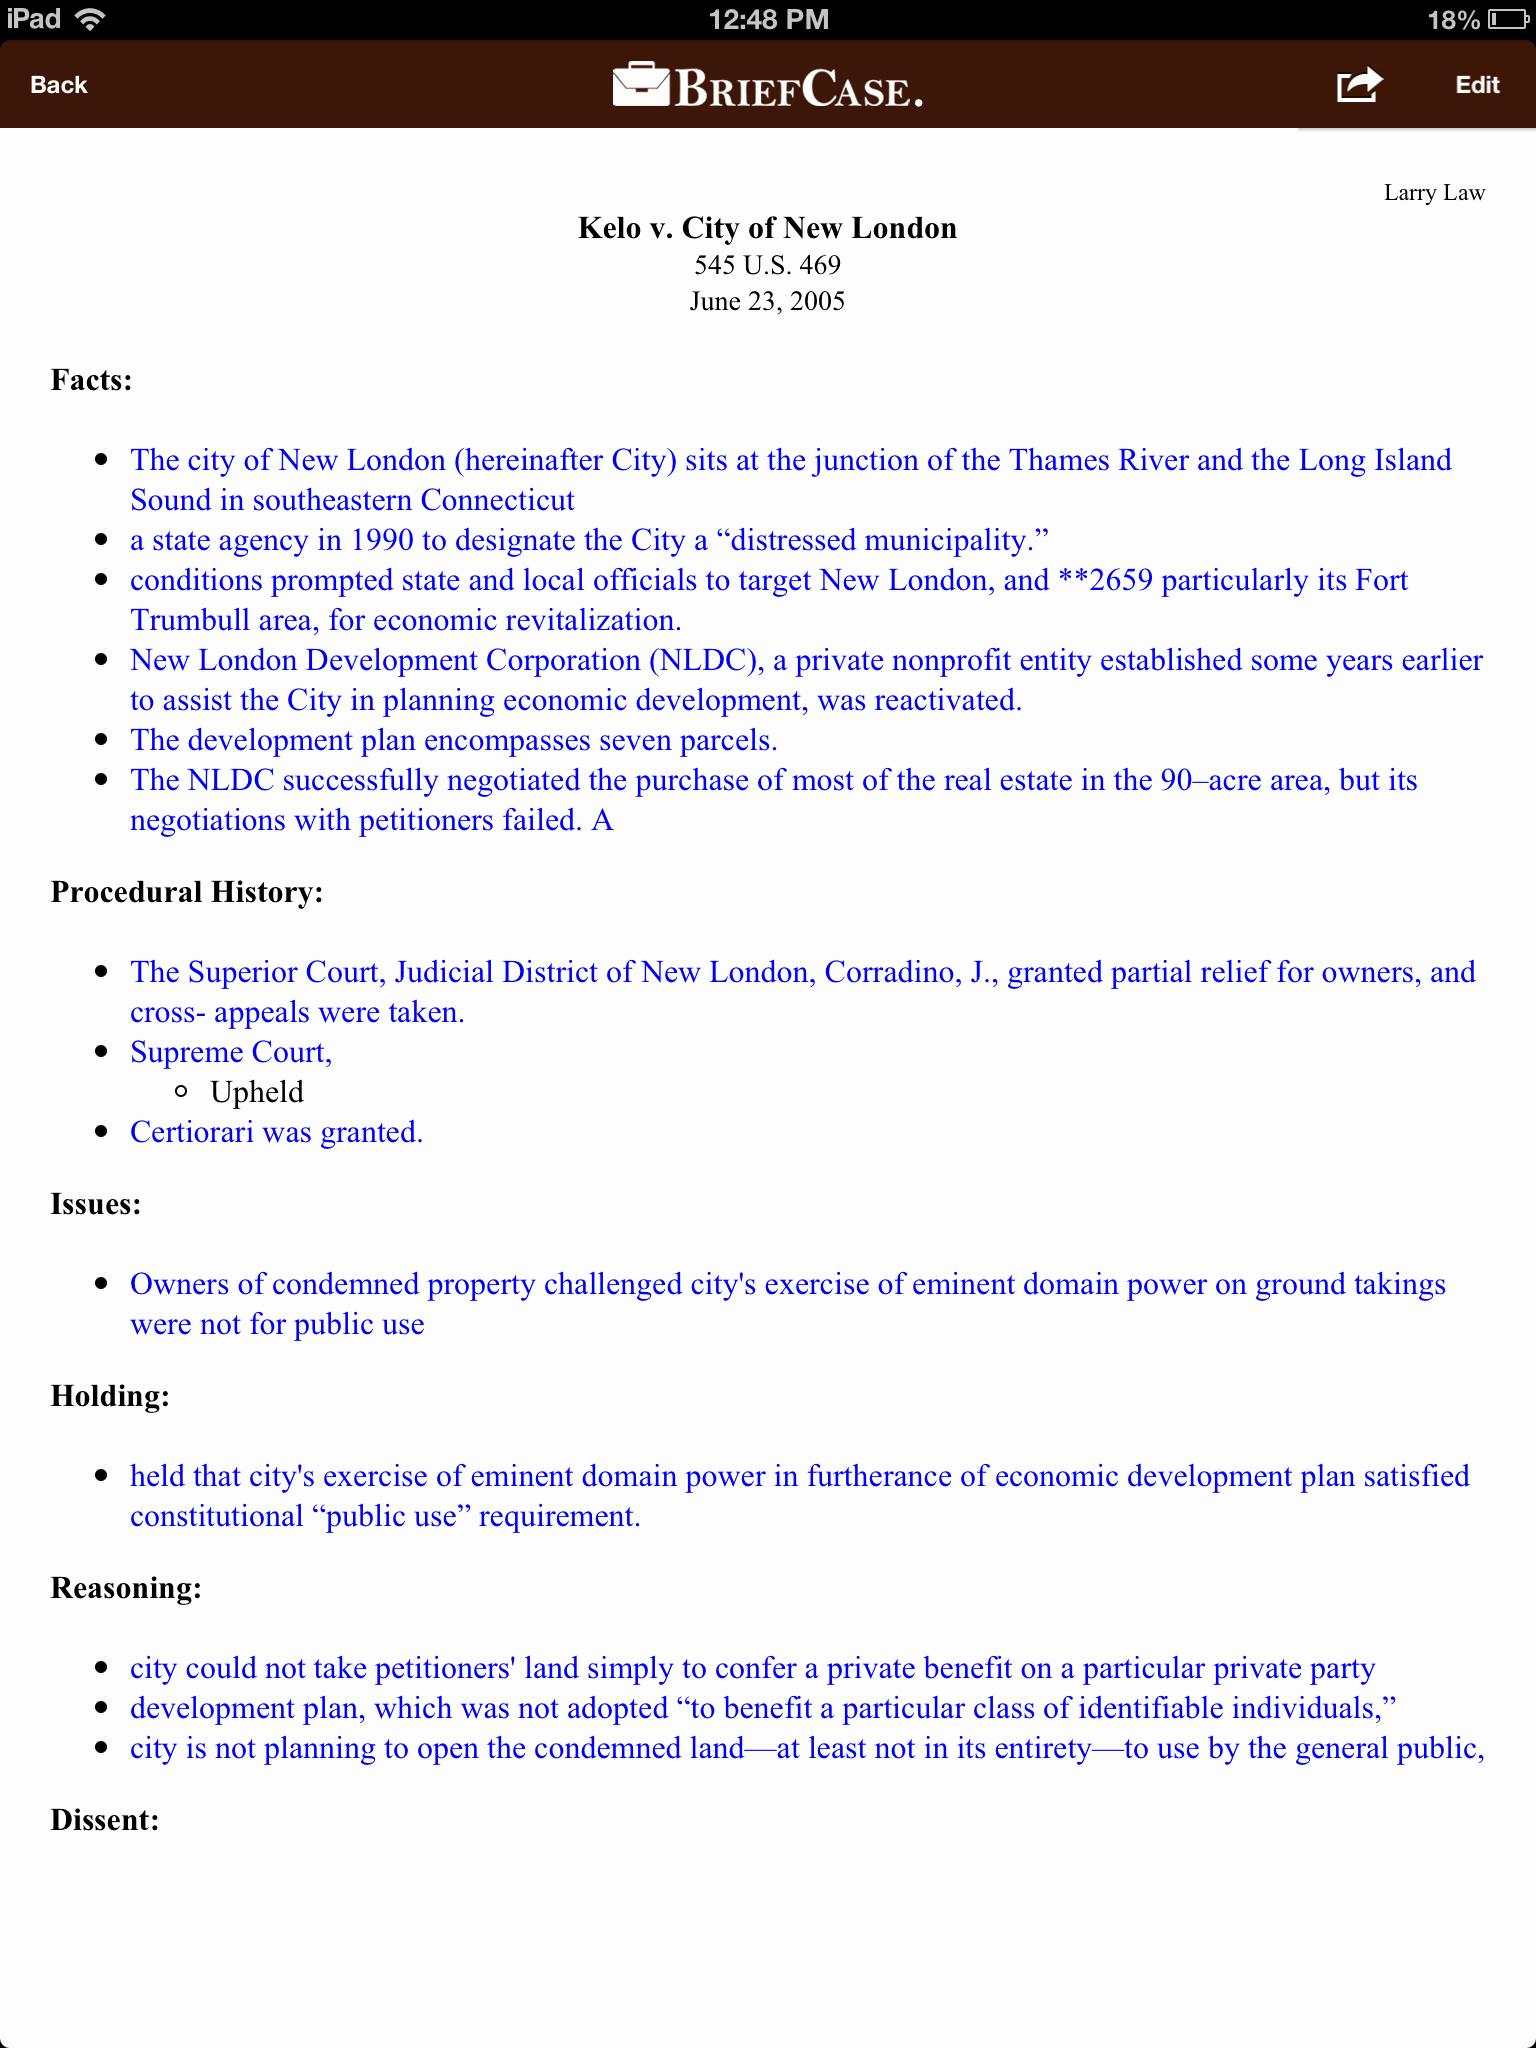 Law School Case Brief Template Elegant 9 Best Of Interoffice Memo format App Law School